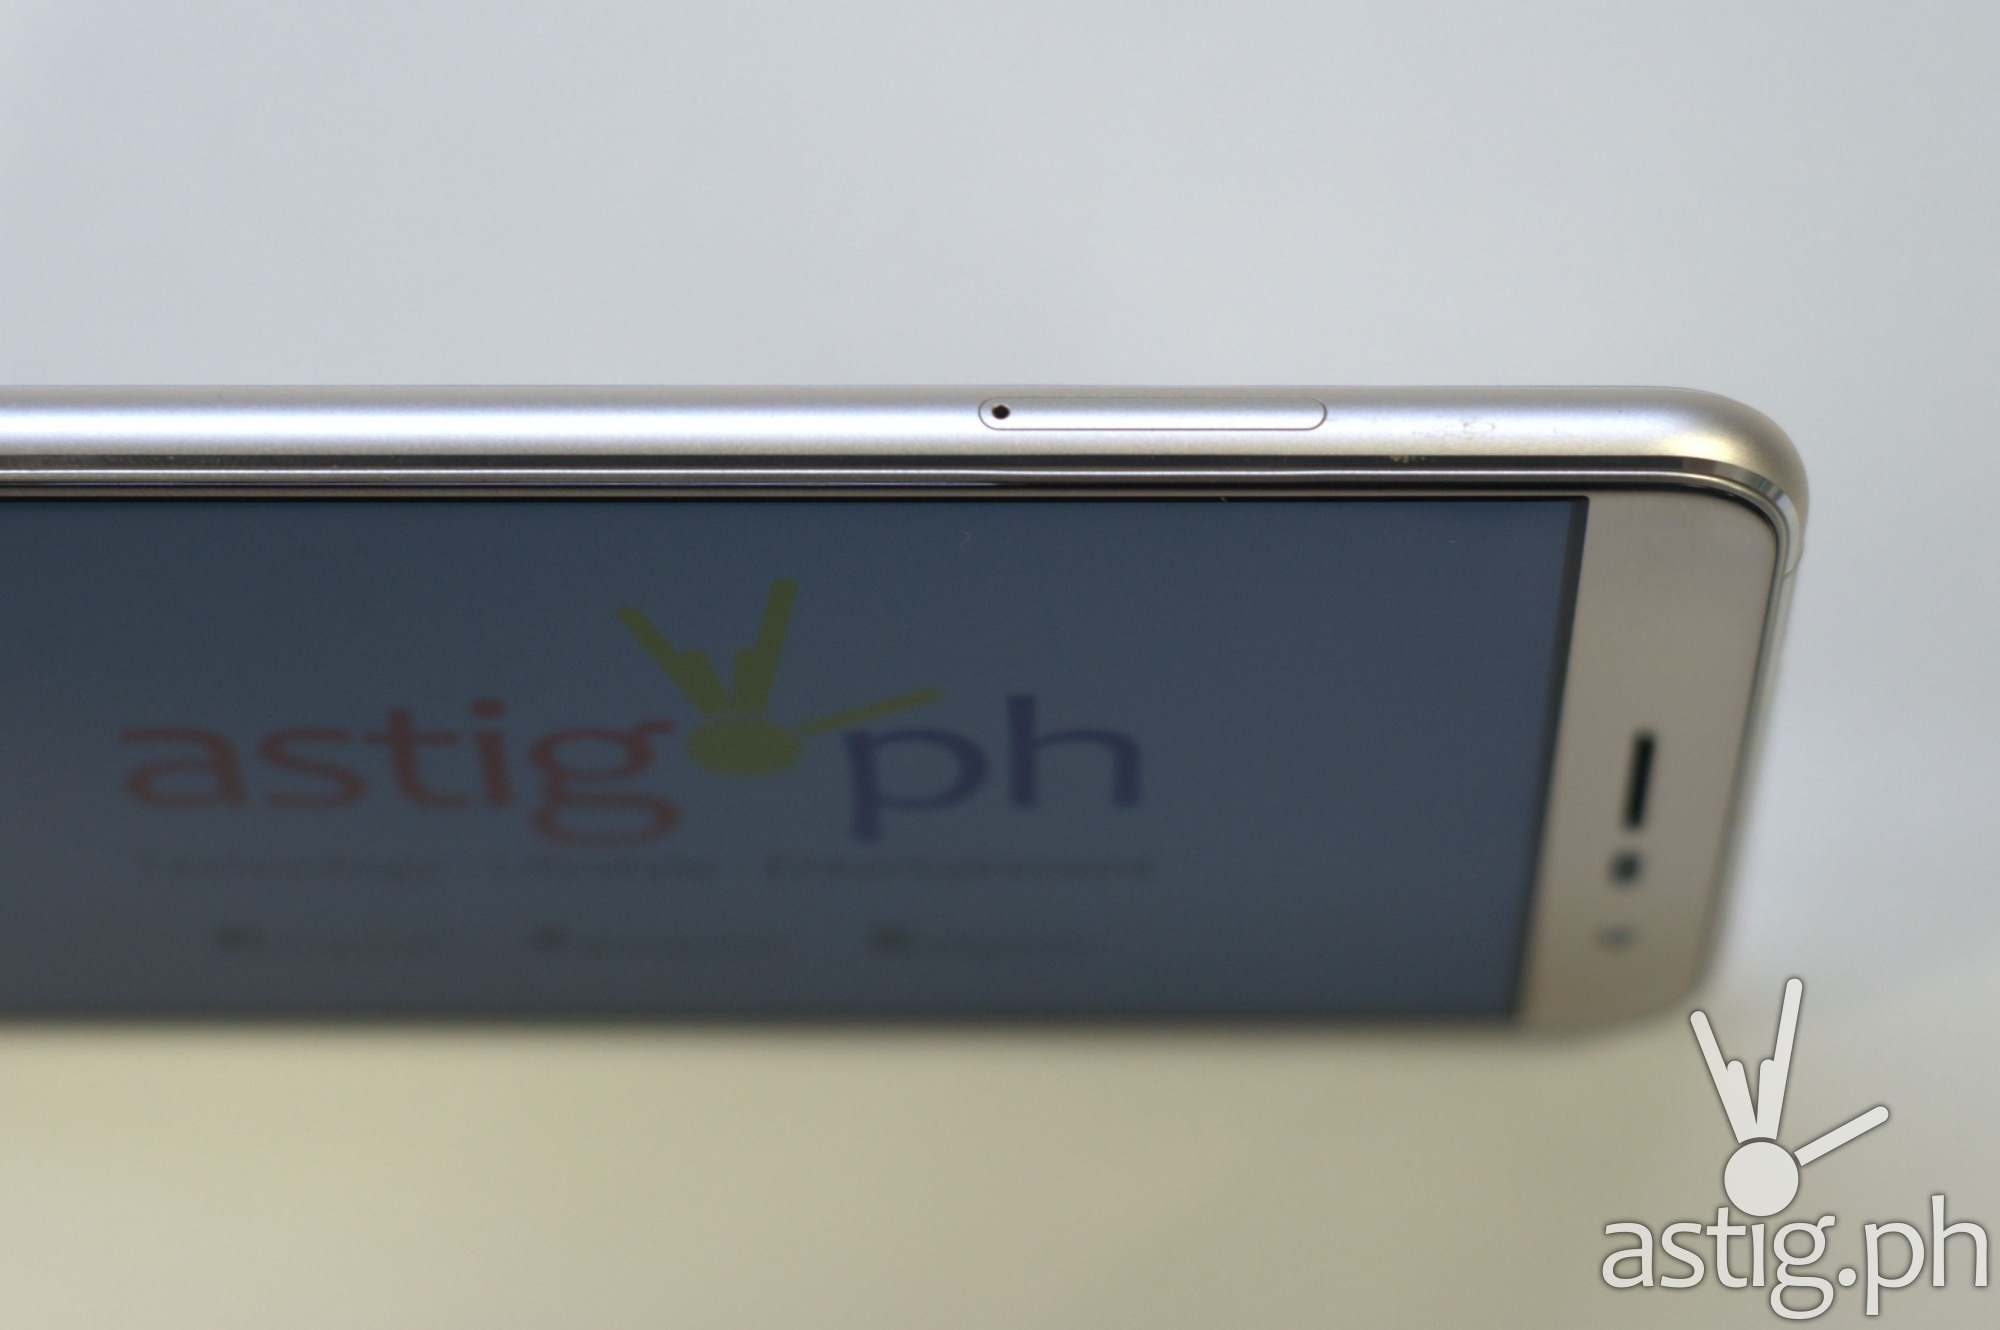 ASUS ZenFone 3 SIM tray slot